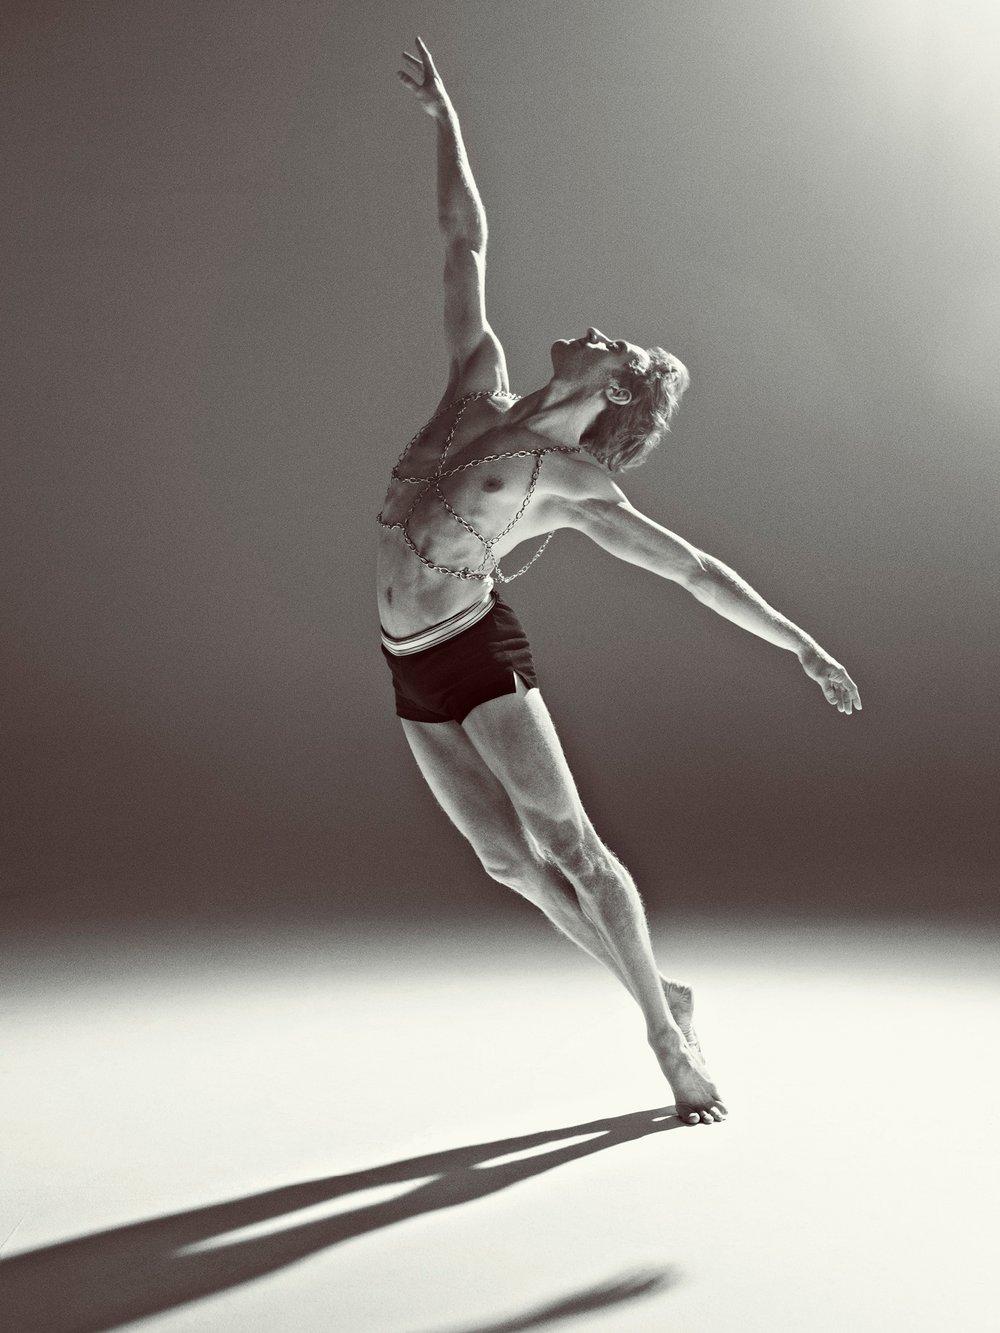 Image of Steven McRae II - Principal Dancer of The Royal Ballet